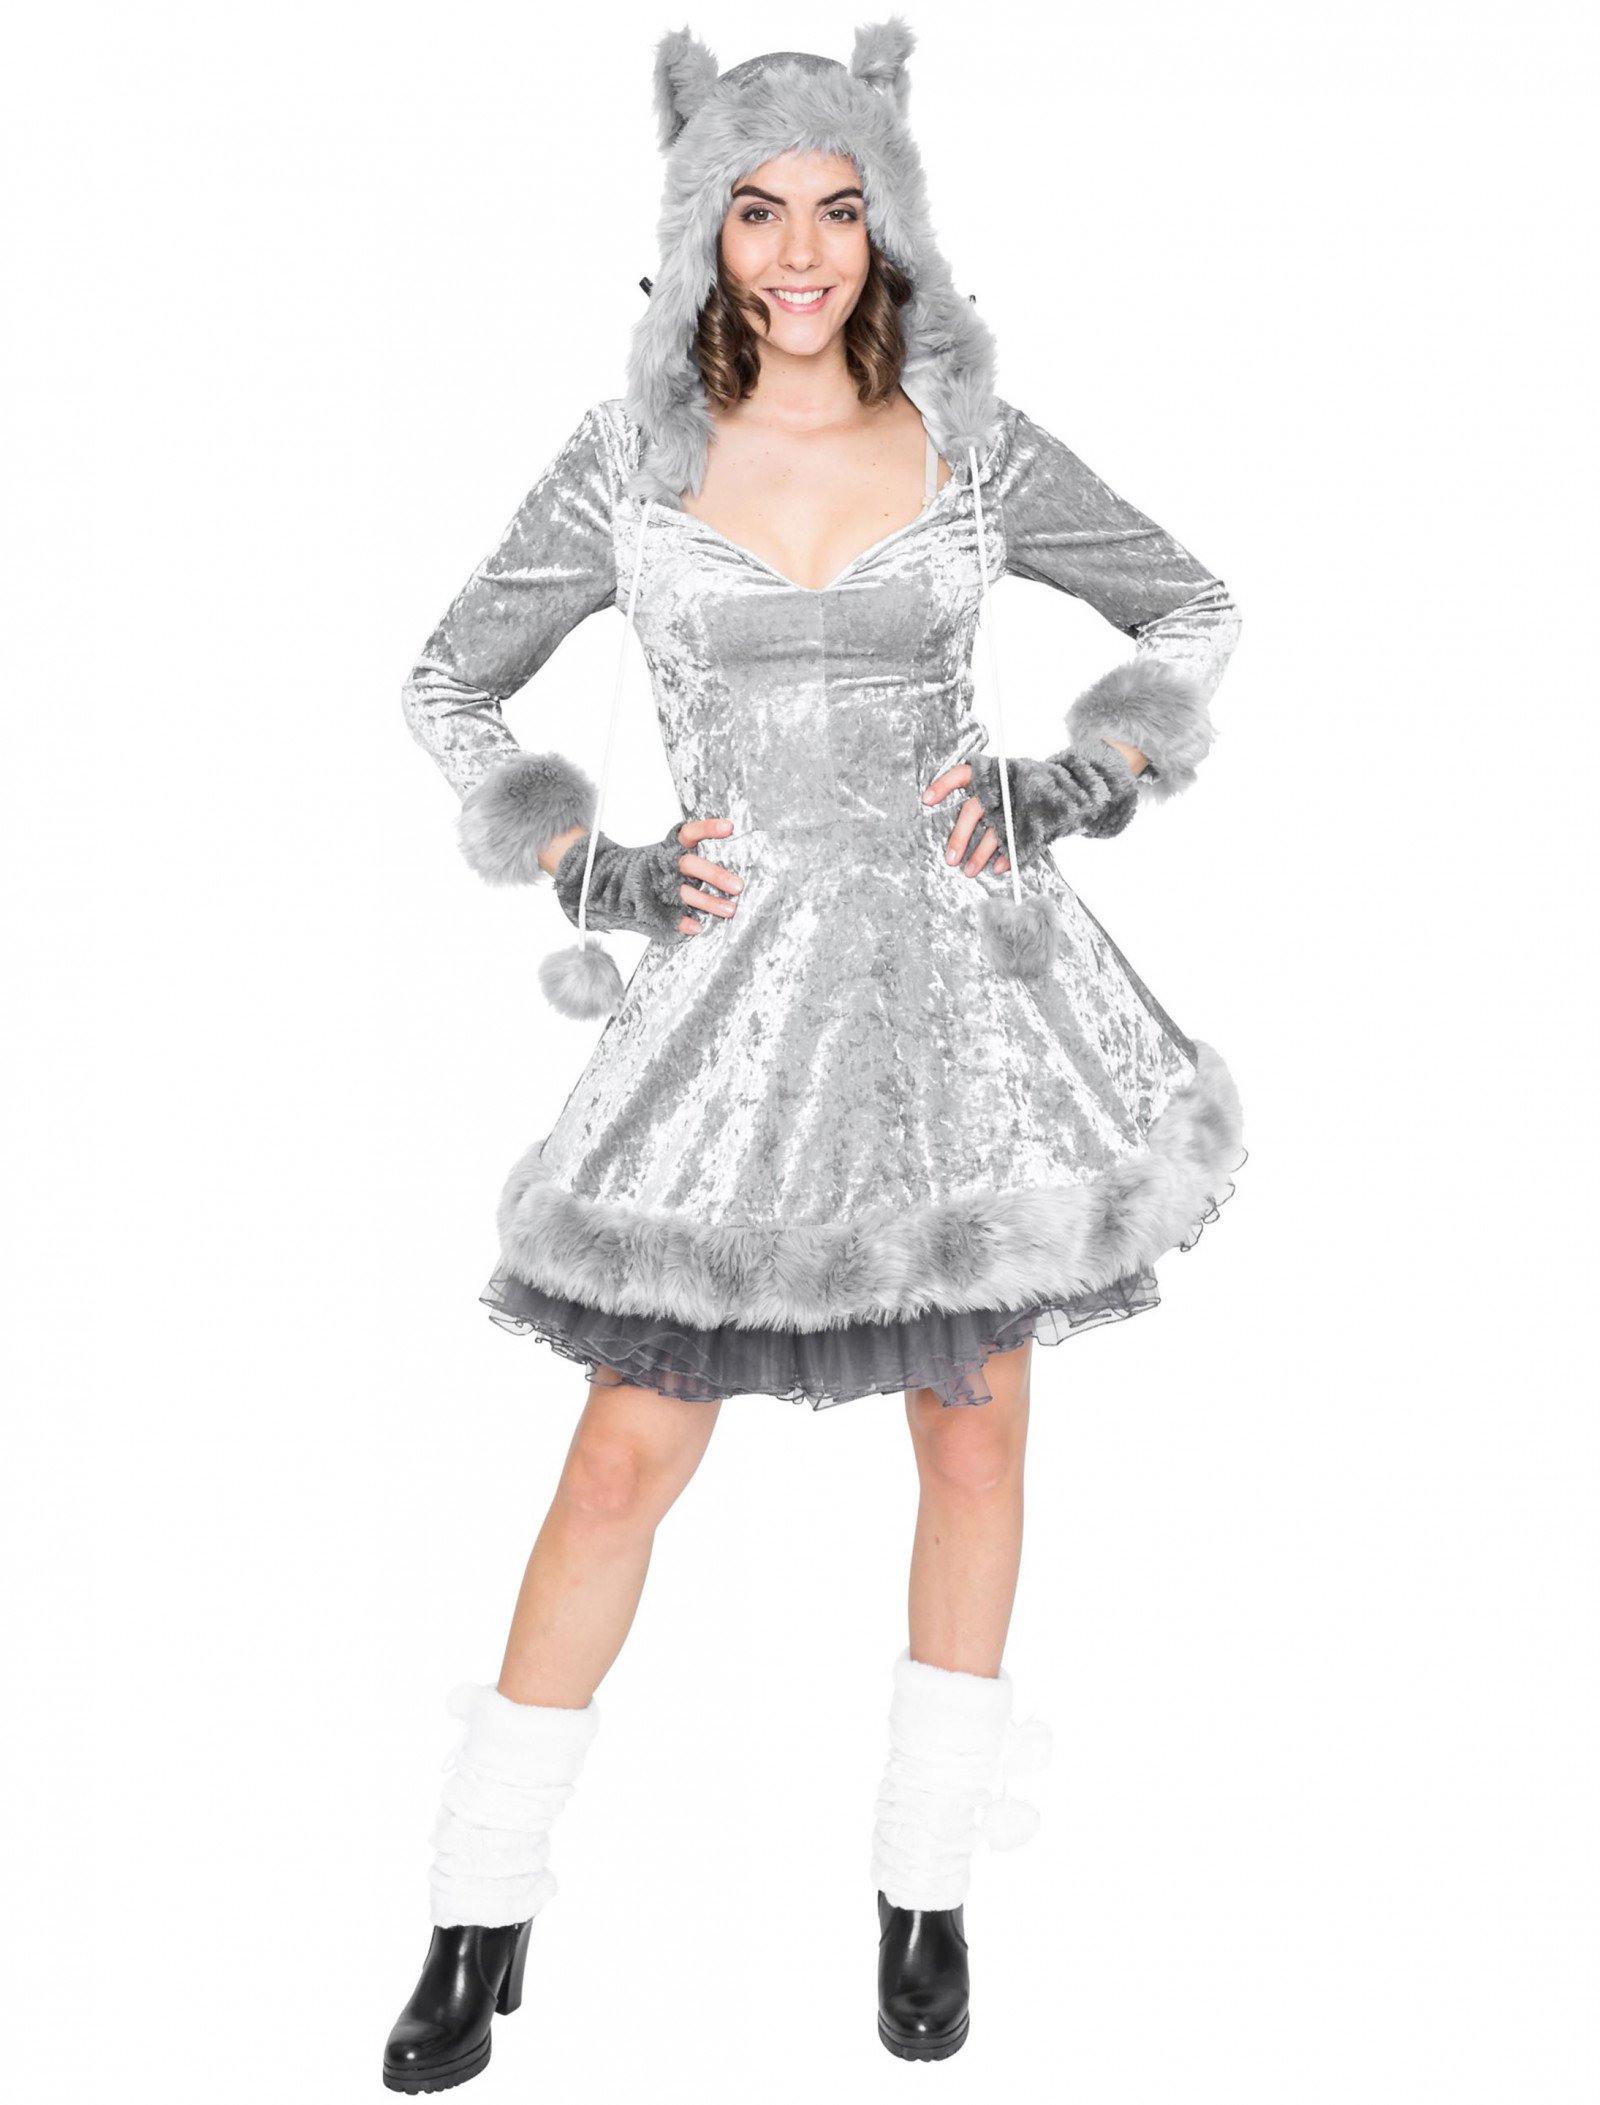 15 Perfekt Schickes Kleid Damen Stylish20 Elegant Schickes Kleid Damen Ärmel